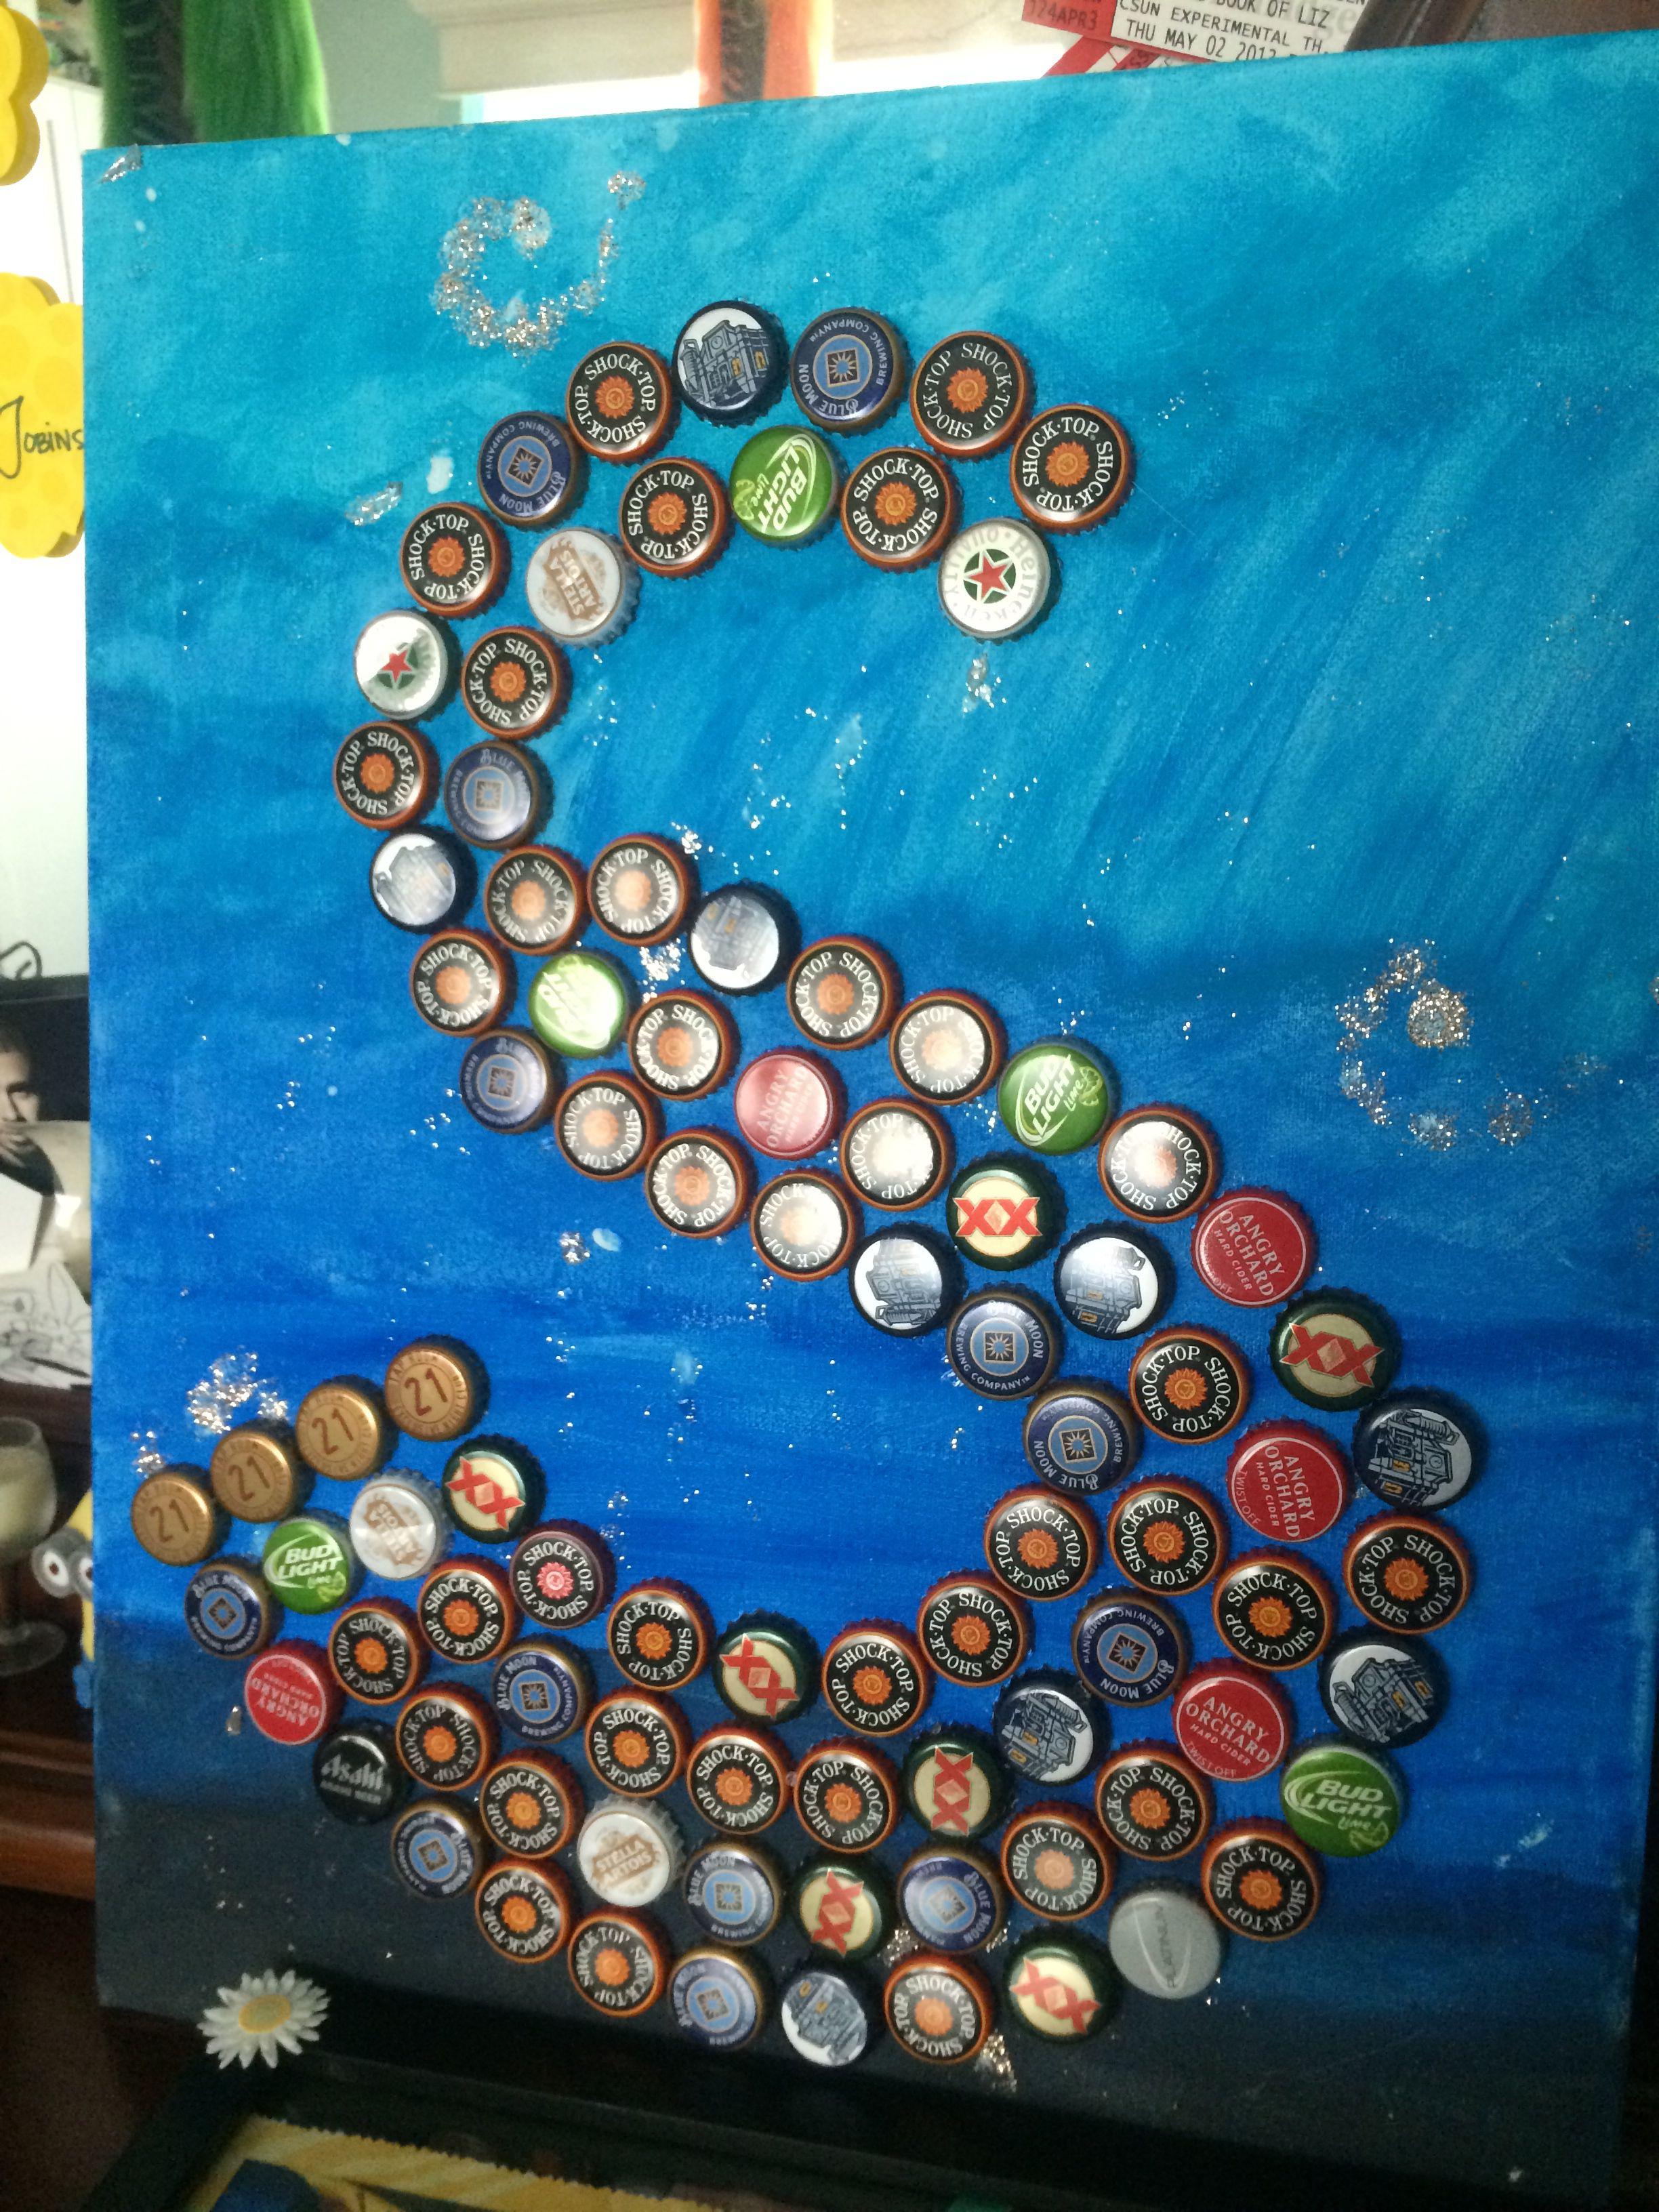 Diy 21St Birthday Gift Idea 1 Get Canvas Paint As